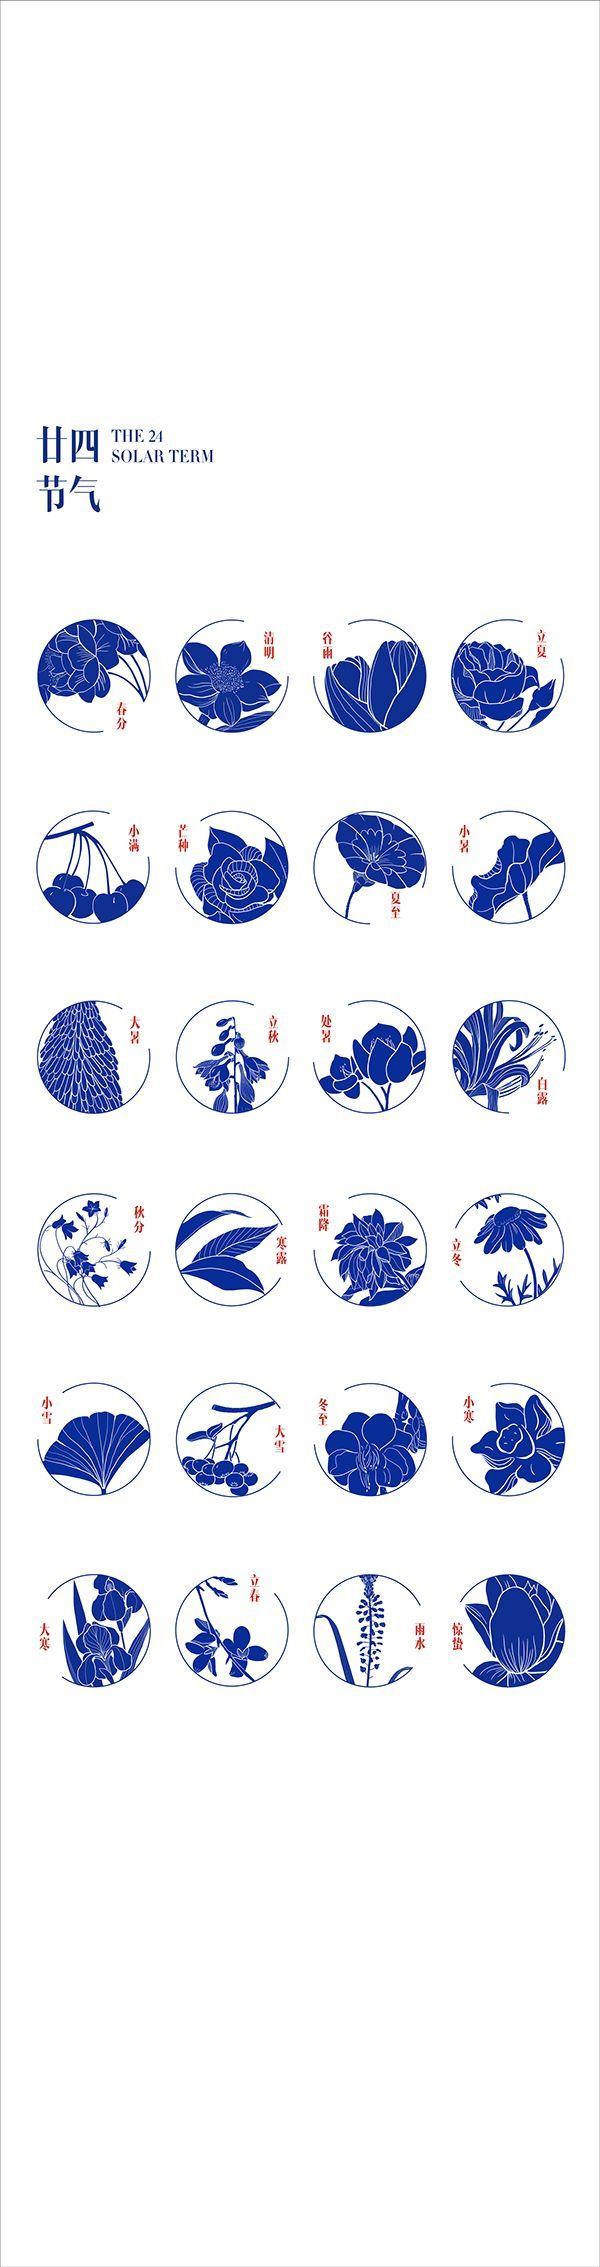 Chinese Lunar Calendar Redesign by Chu Crystal, via Behance #Uncategorized